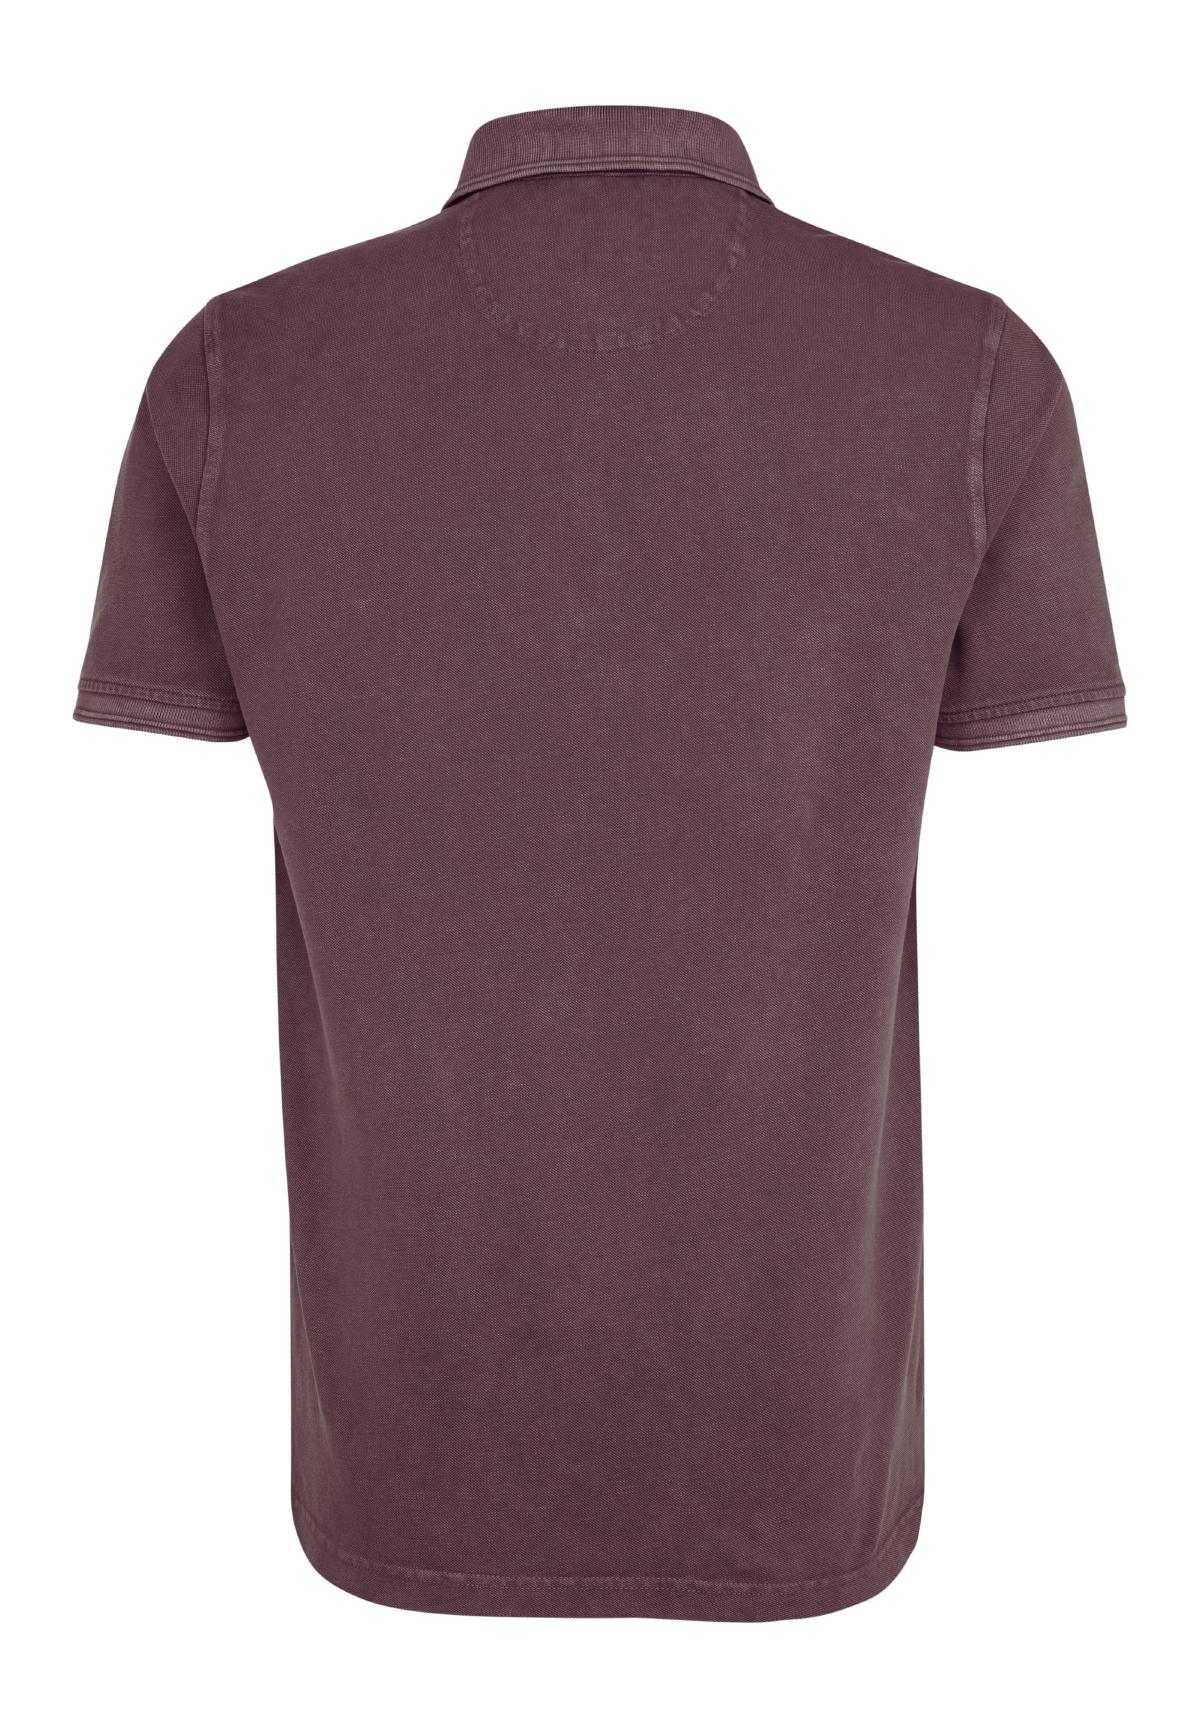 Camel-Active-Herren-Shirt-Poloshirt-Pique-Regular-Fit-NEU Indexbild 93